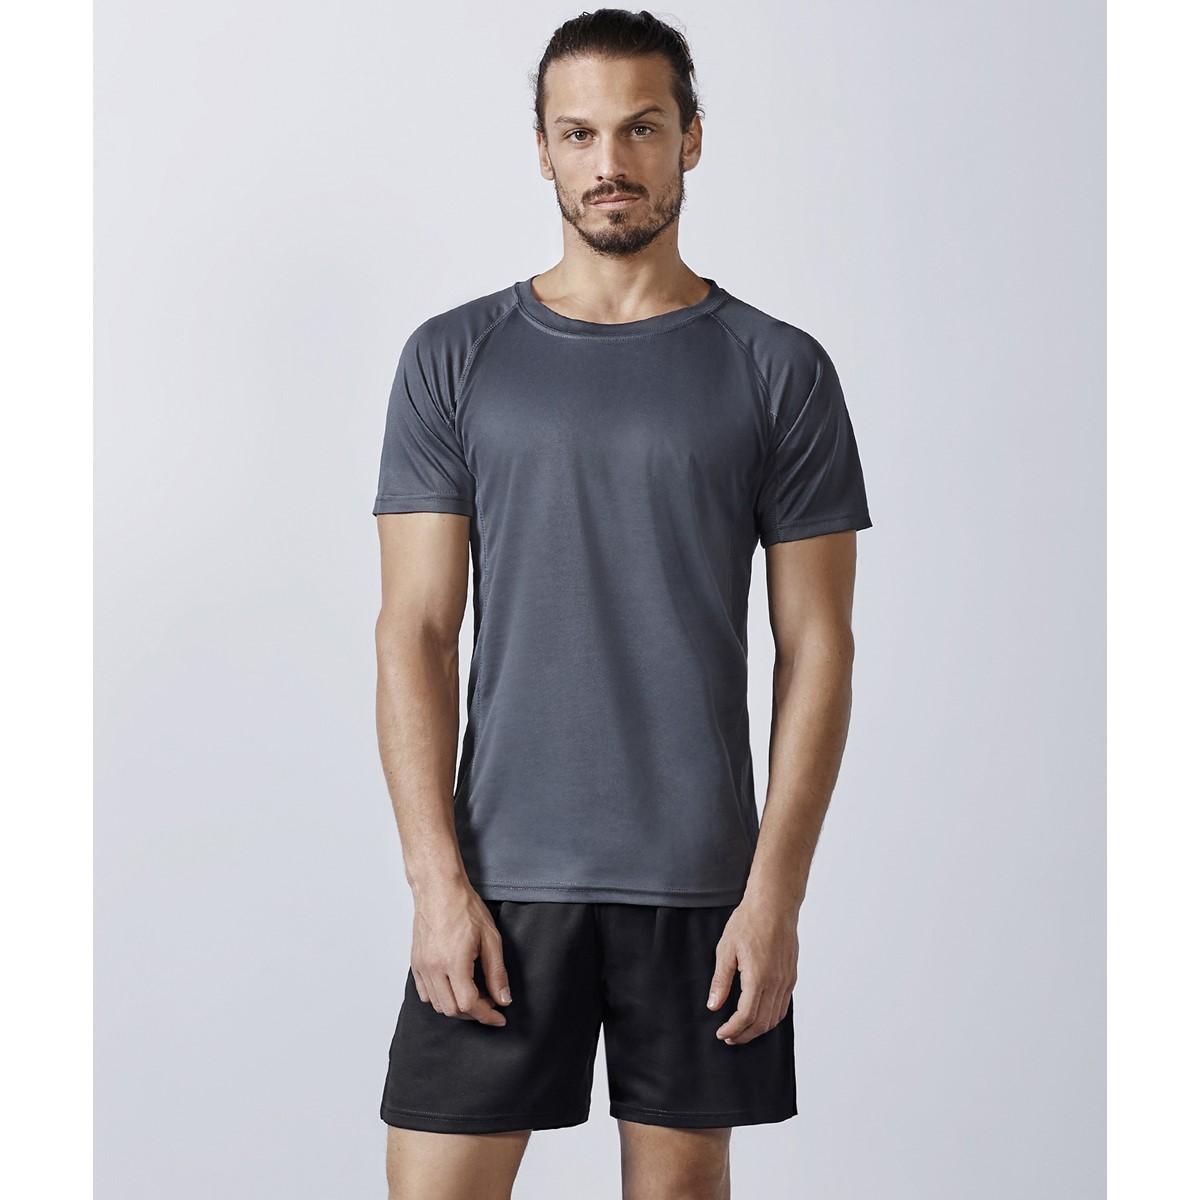 5c8bb148ee131e T-shirt Roly MONTECARLO